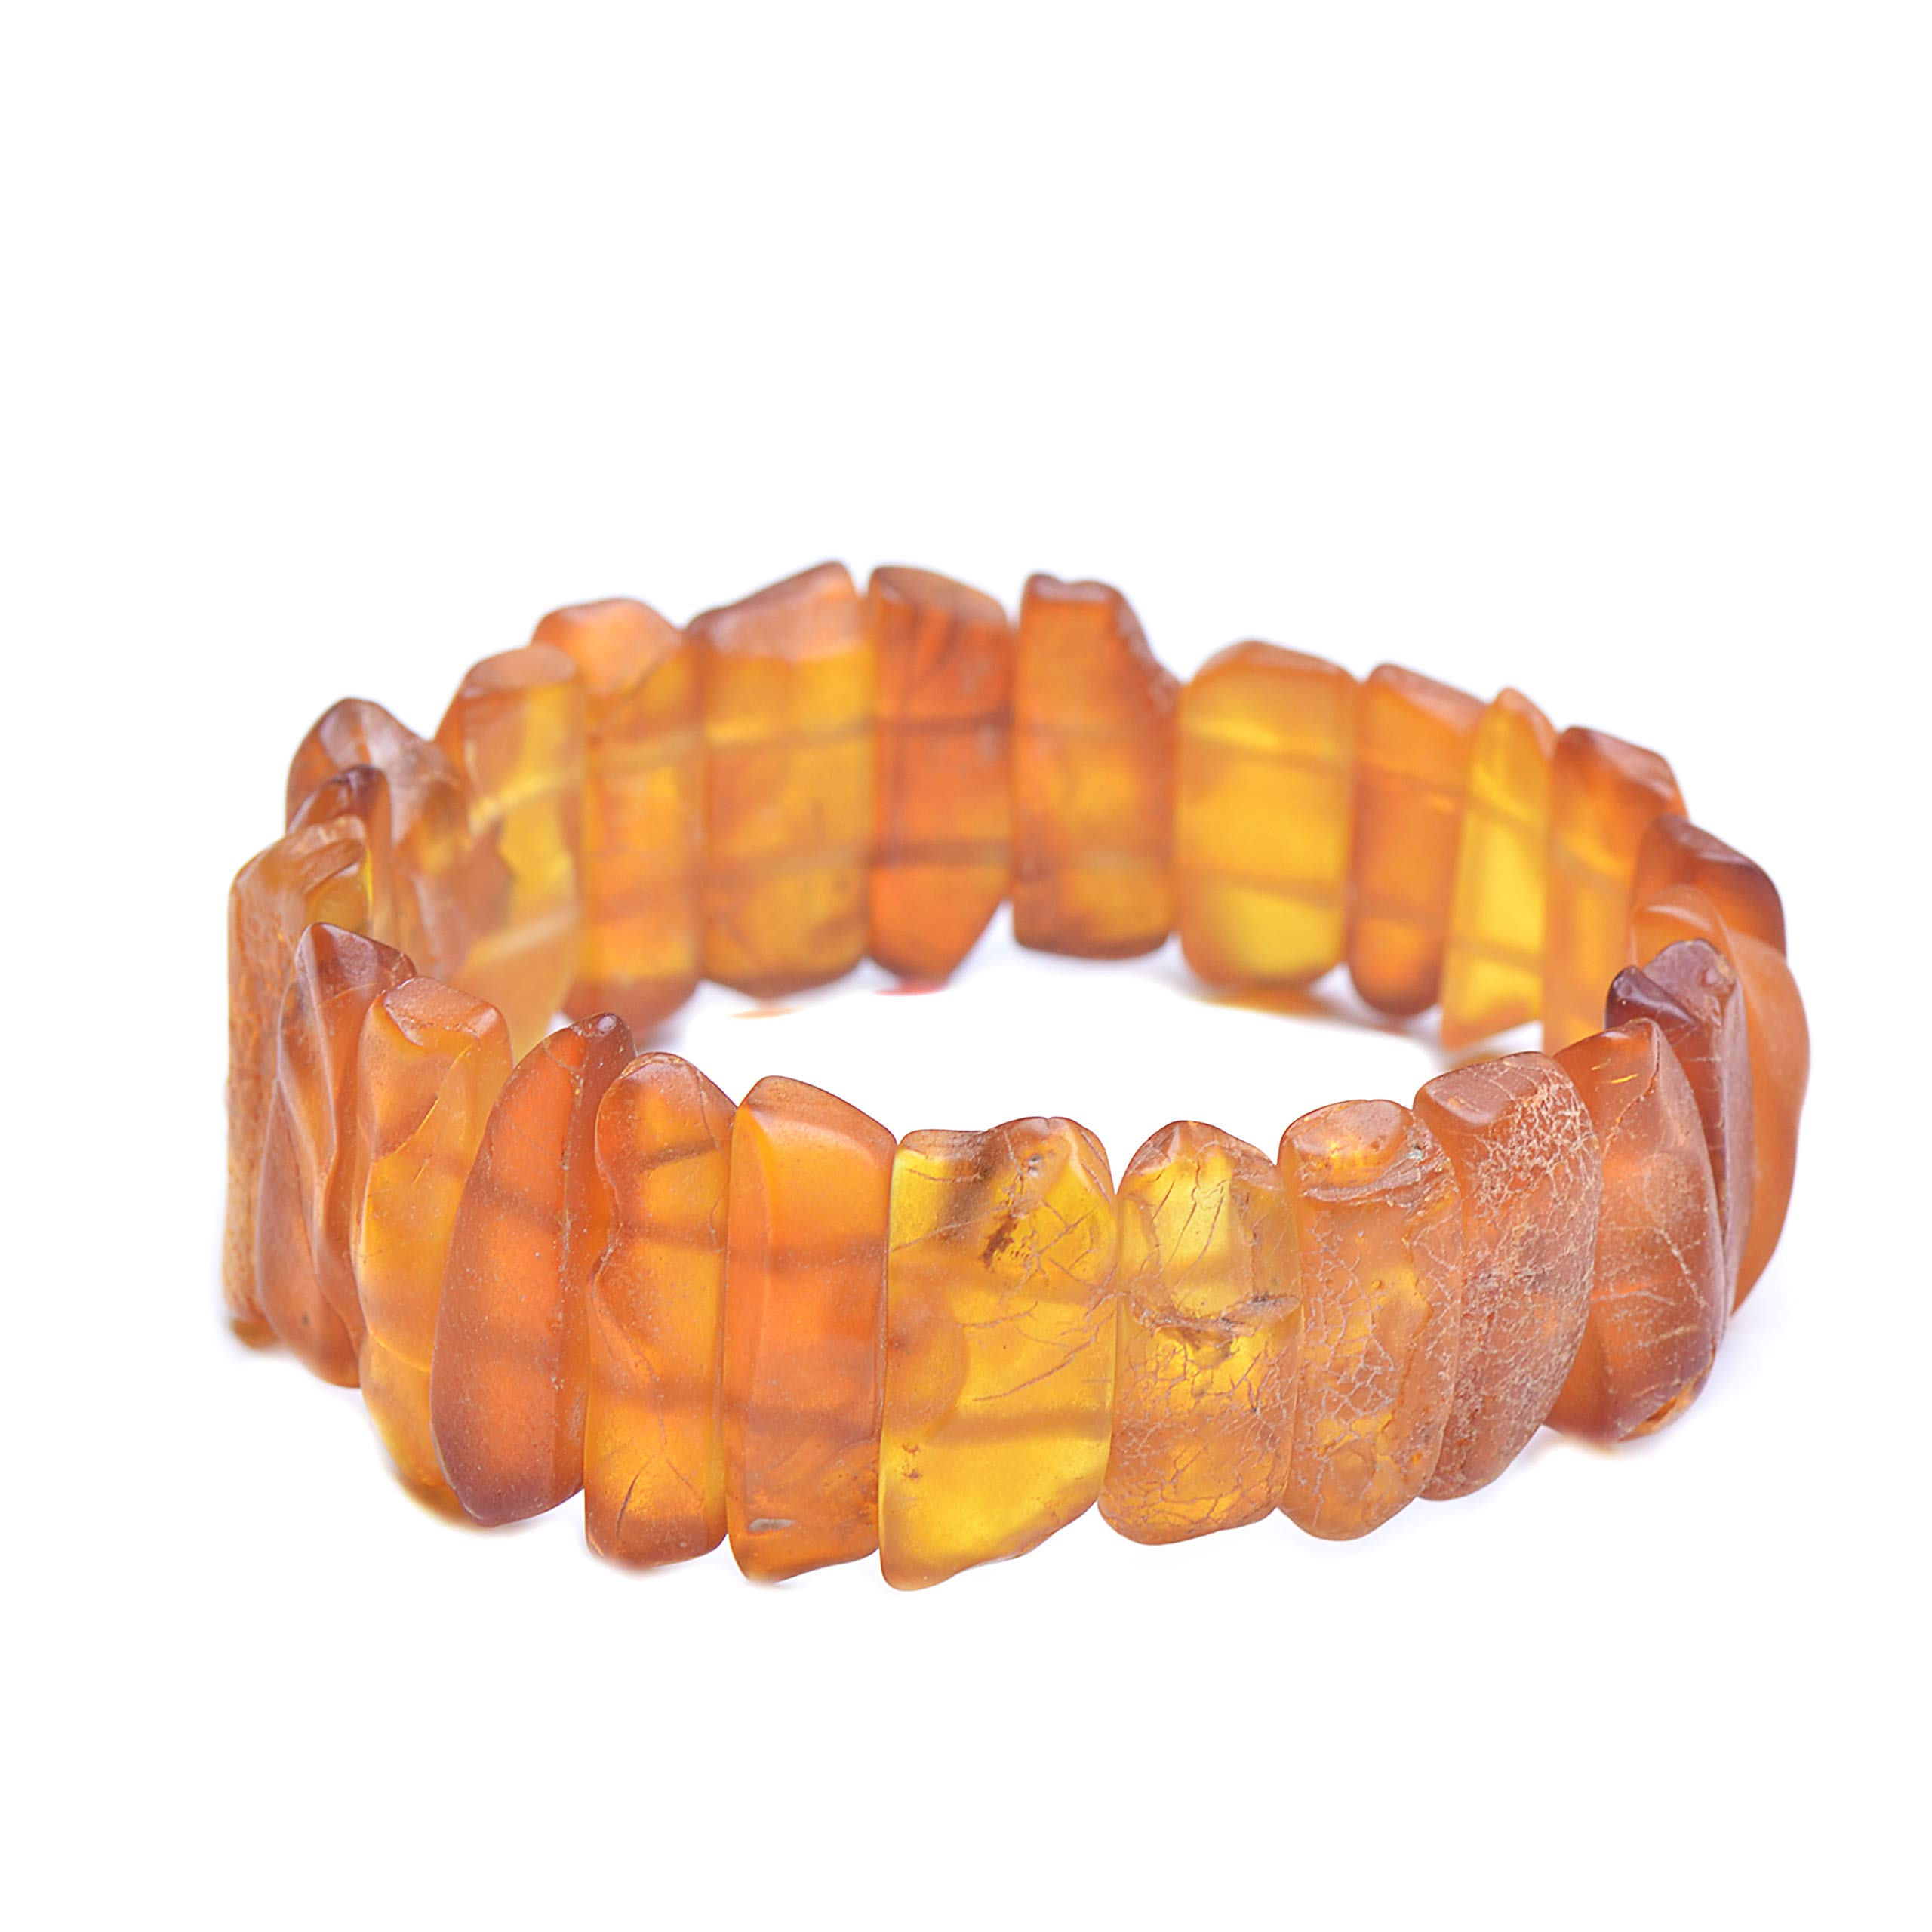 Amber Bracelet - Unique Amber Bracelet - Exclusive Amber Bracelet - Vintage Bracelet - Genuine Baltic Amber by Genuine Amber (Image #4)